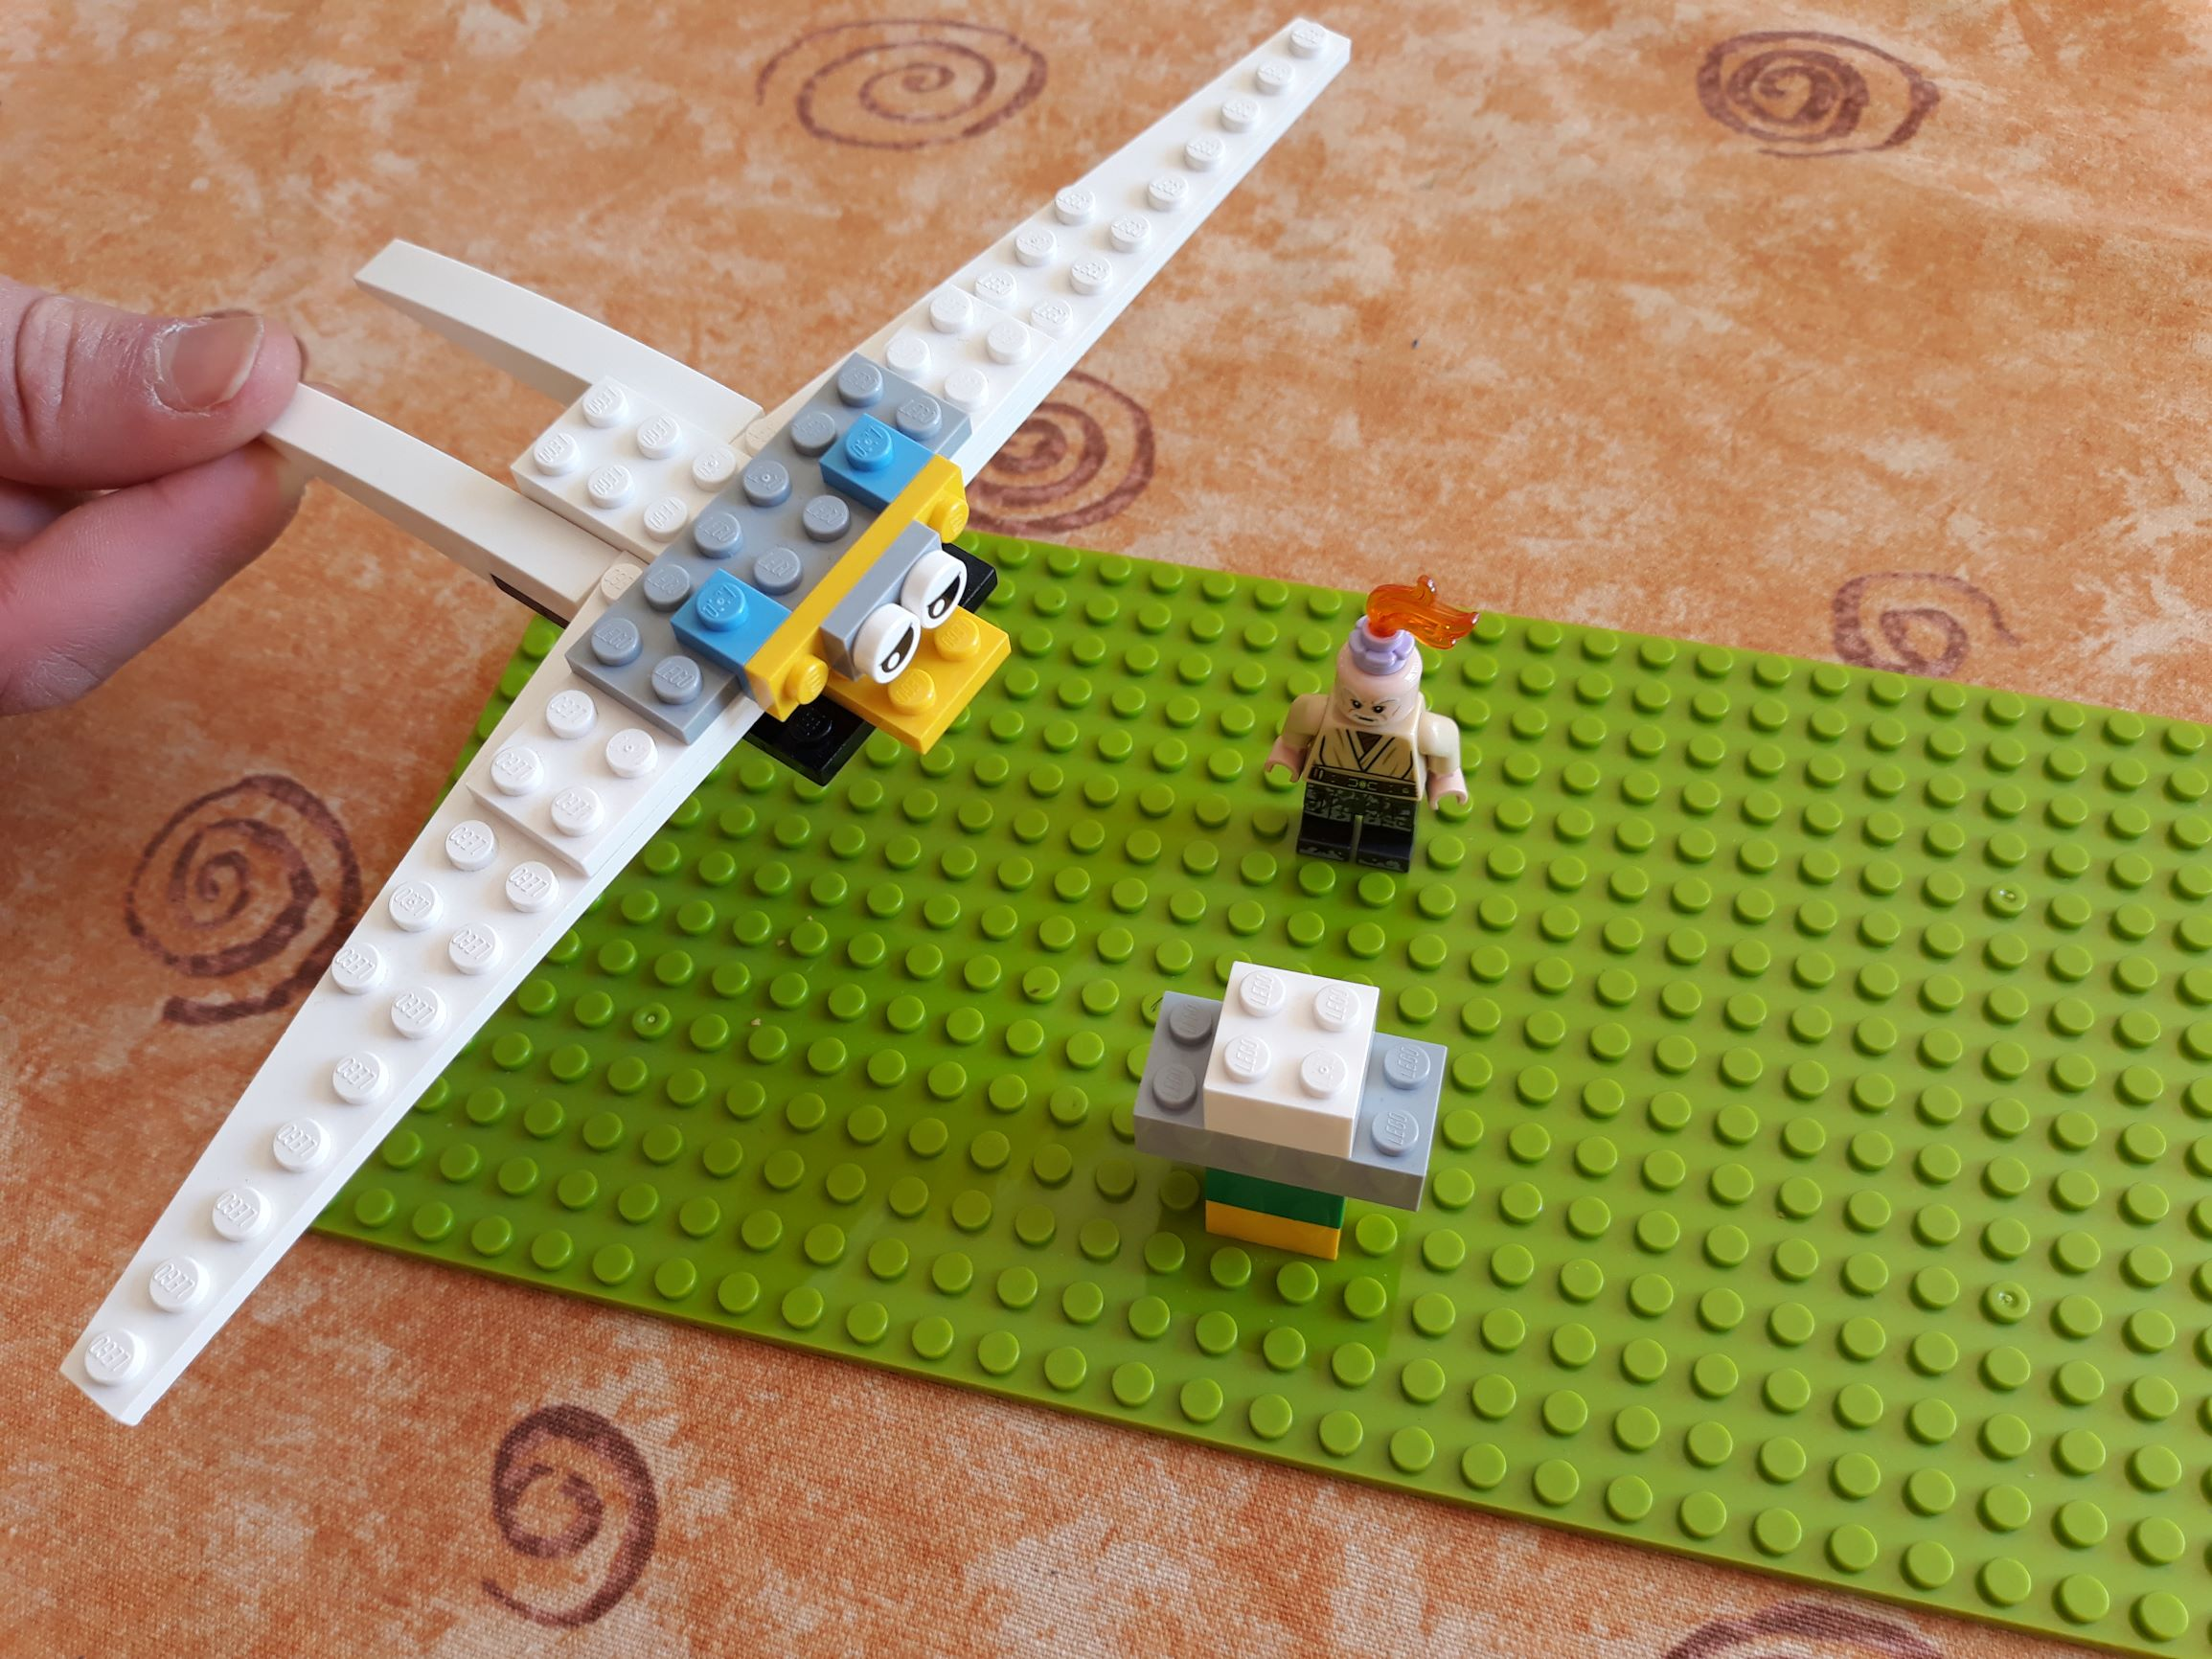 Narek's Pentecost Lego